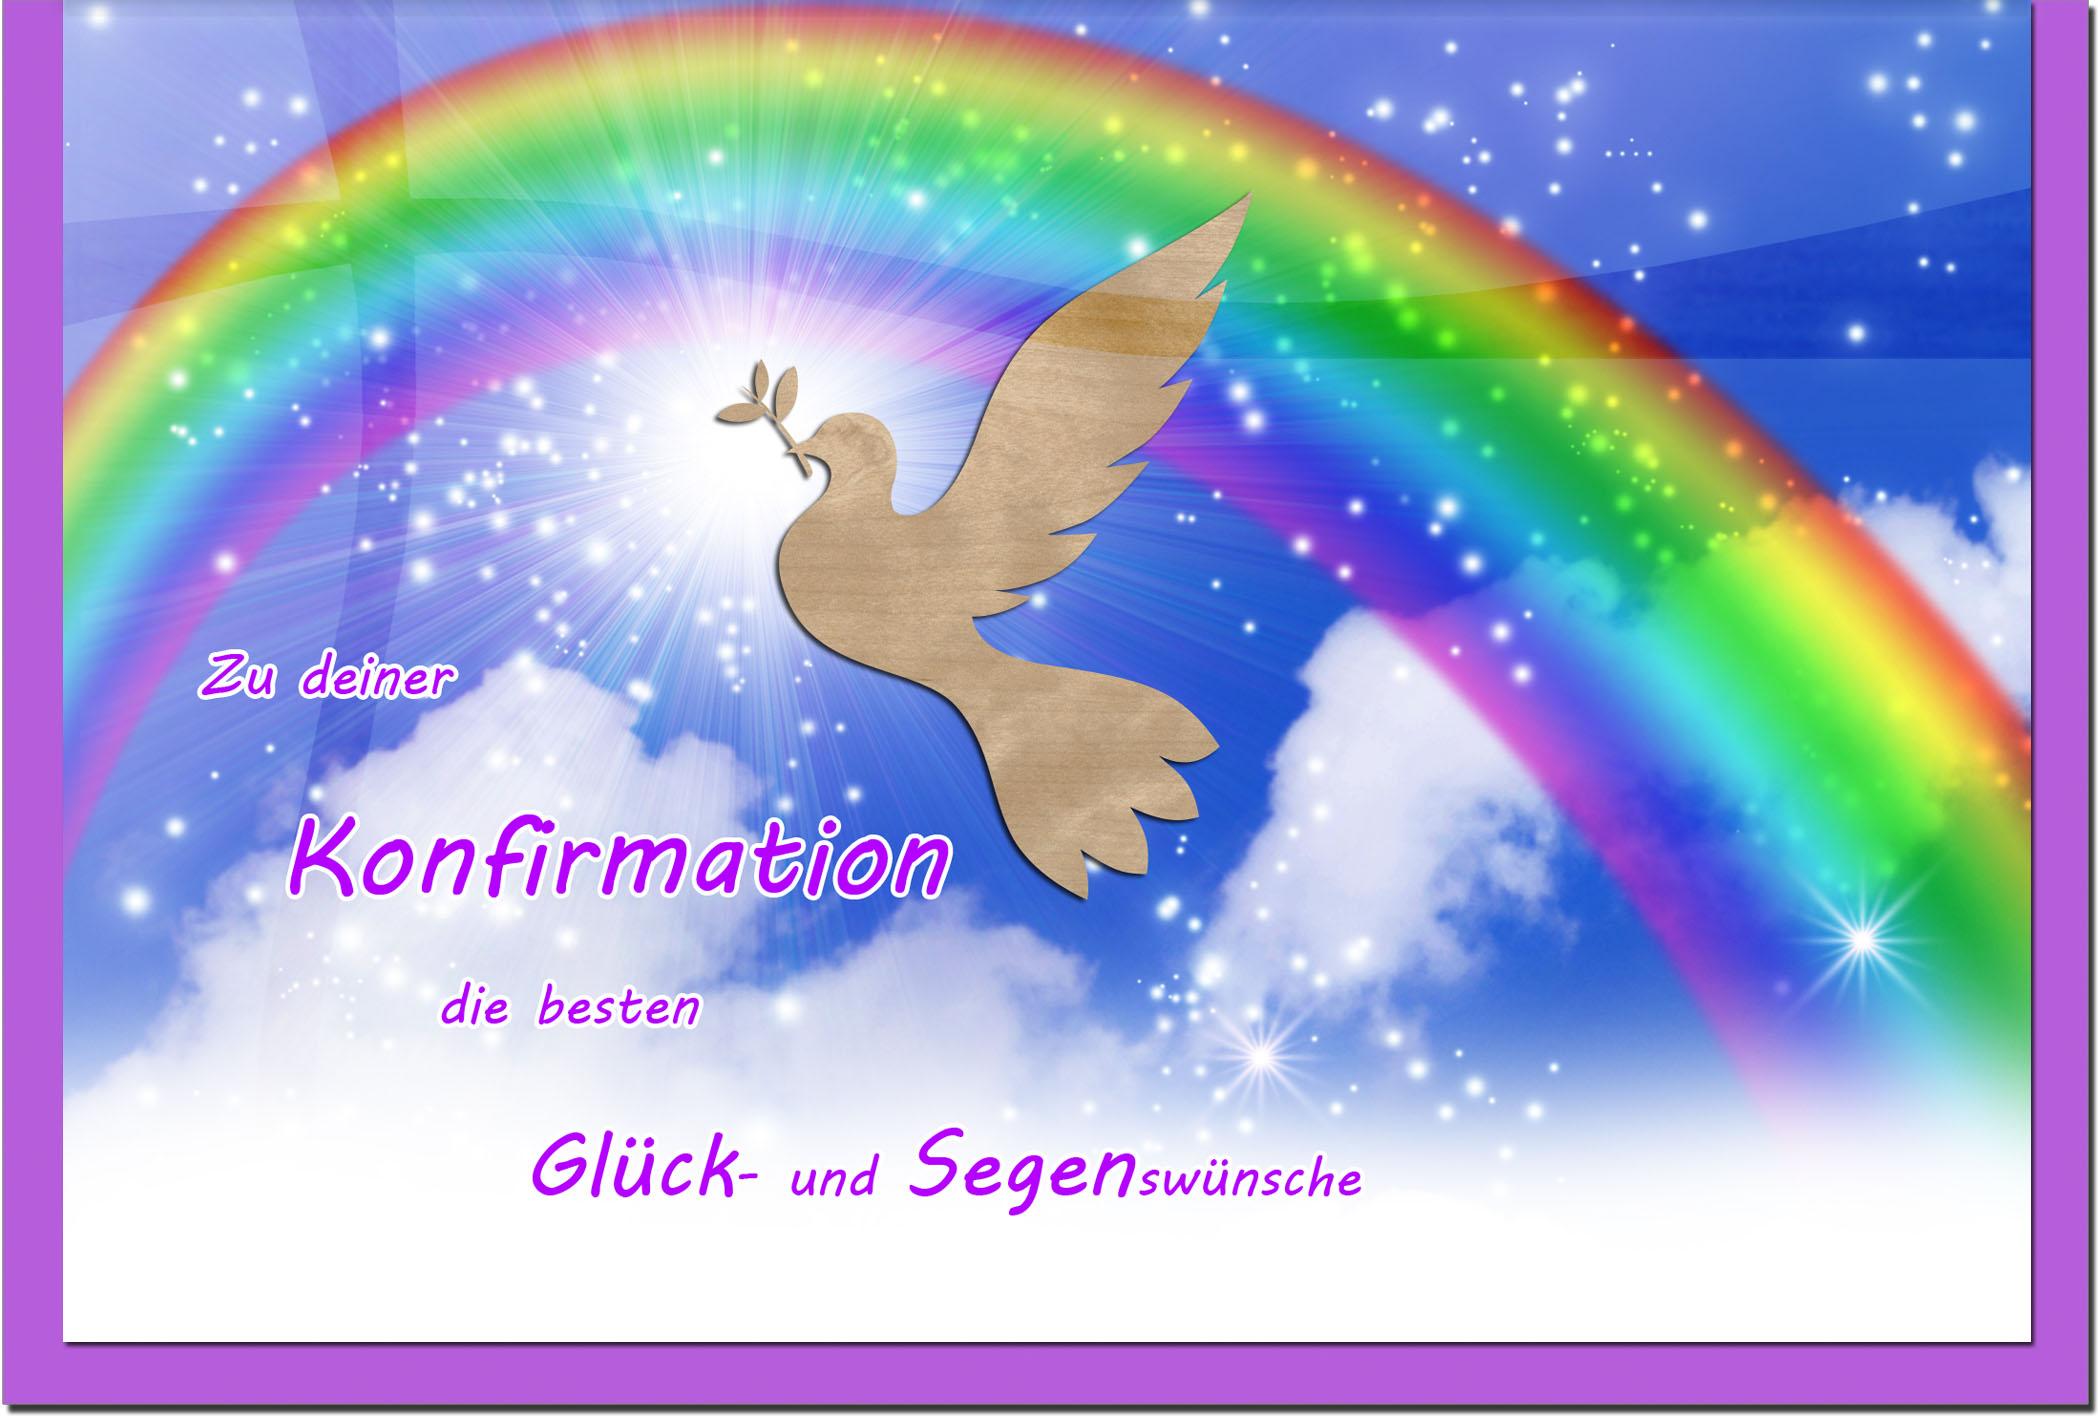 Konfirmationskarten / Grußkarten / Glückwunschkarten /Konfirmation Regenbogen